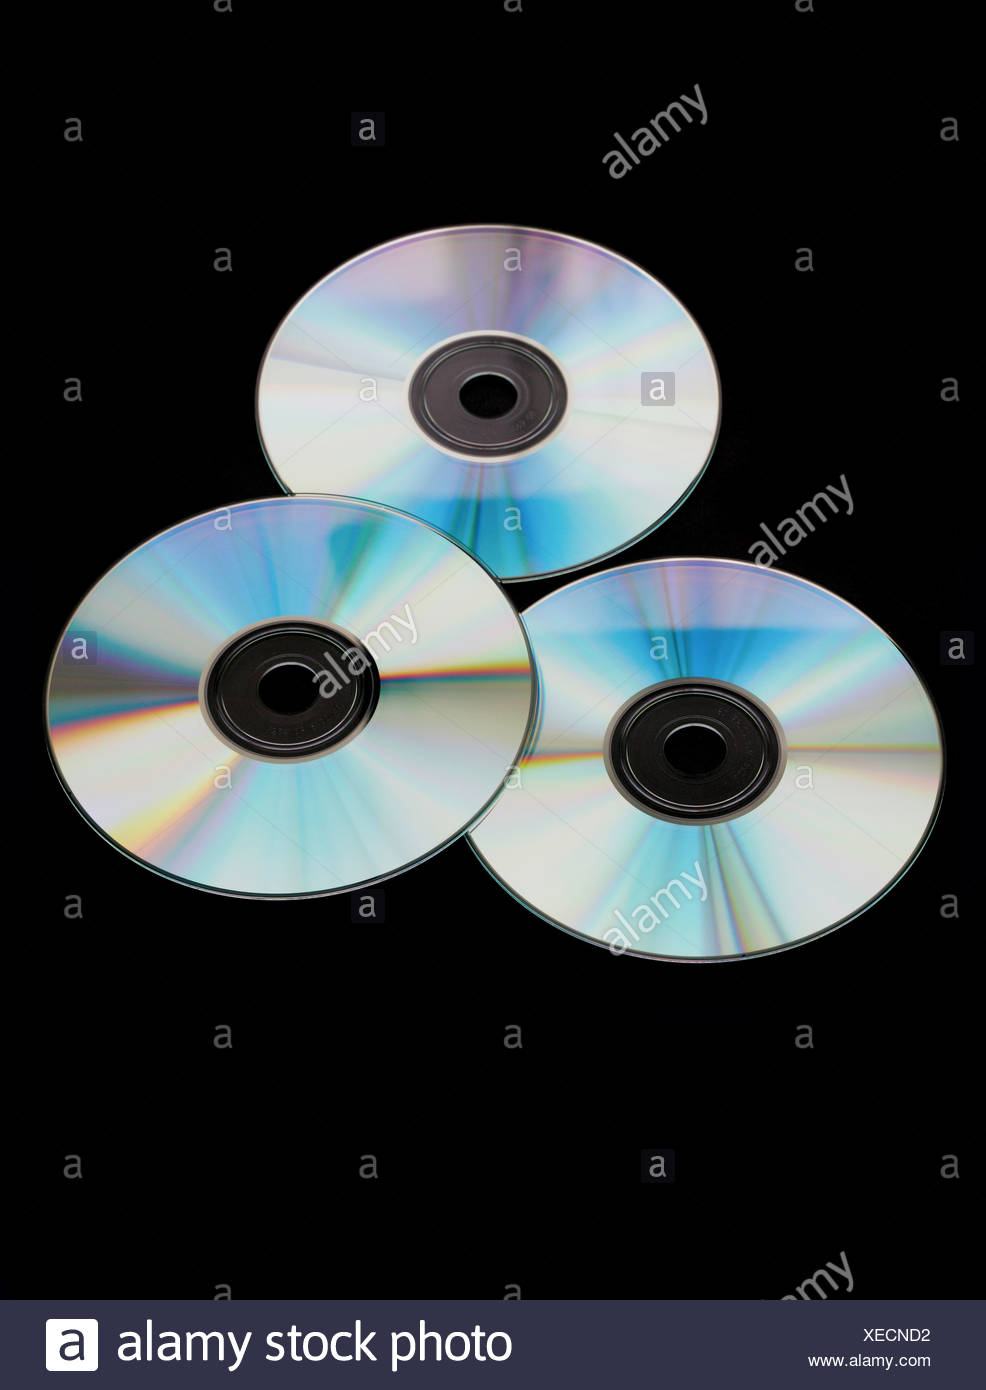 Studio shot of compact disc - Stock Image